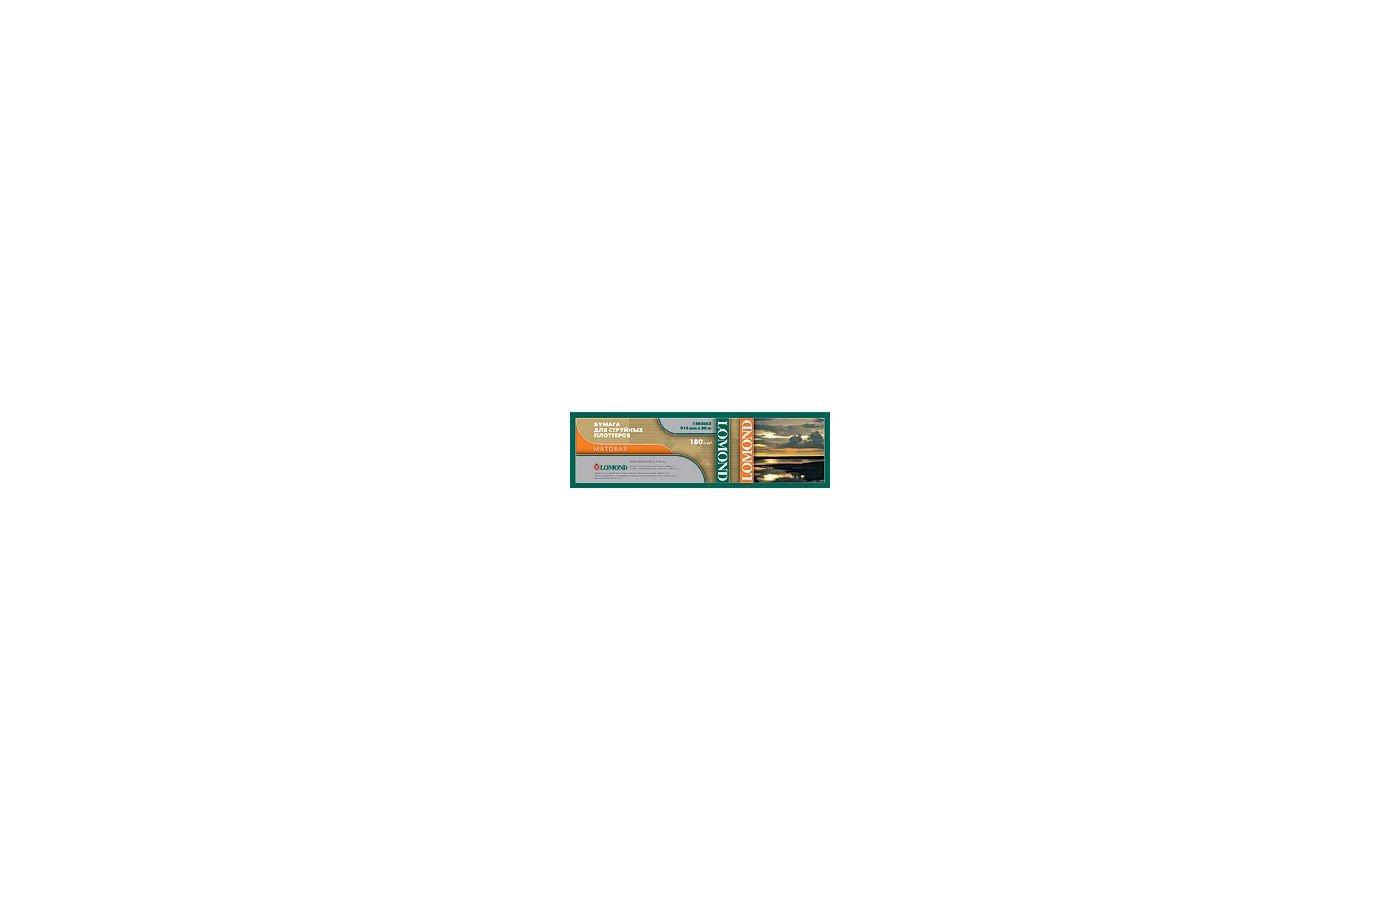 Бумага Lomond 1214201 24/610мм х 45м/80г/м2/рул. для струйной печати